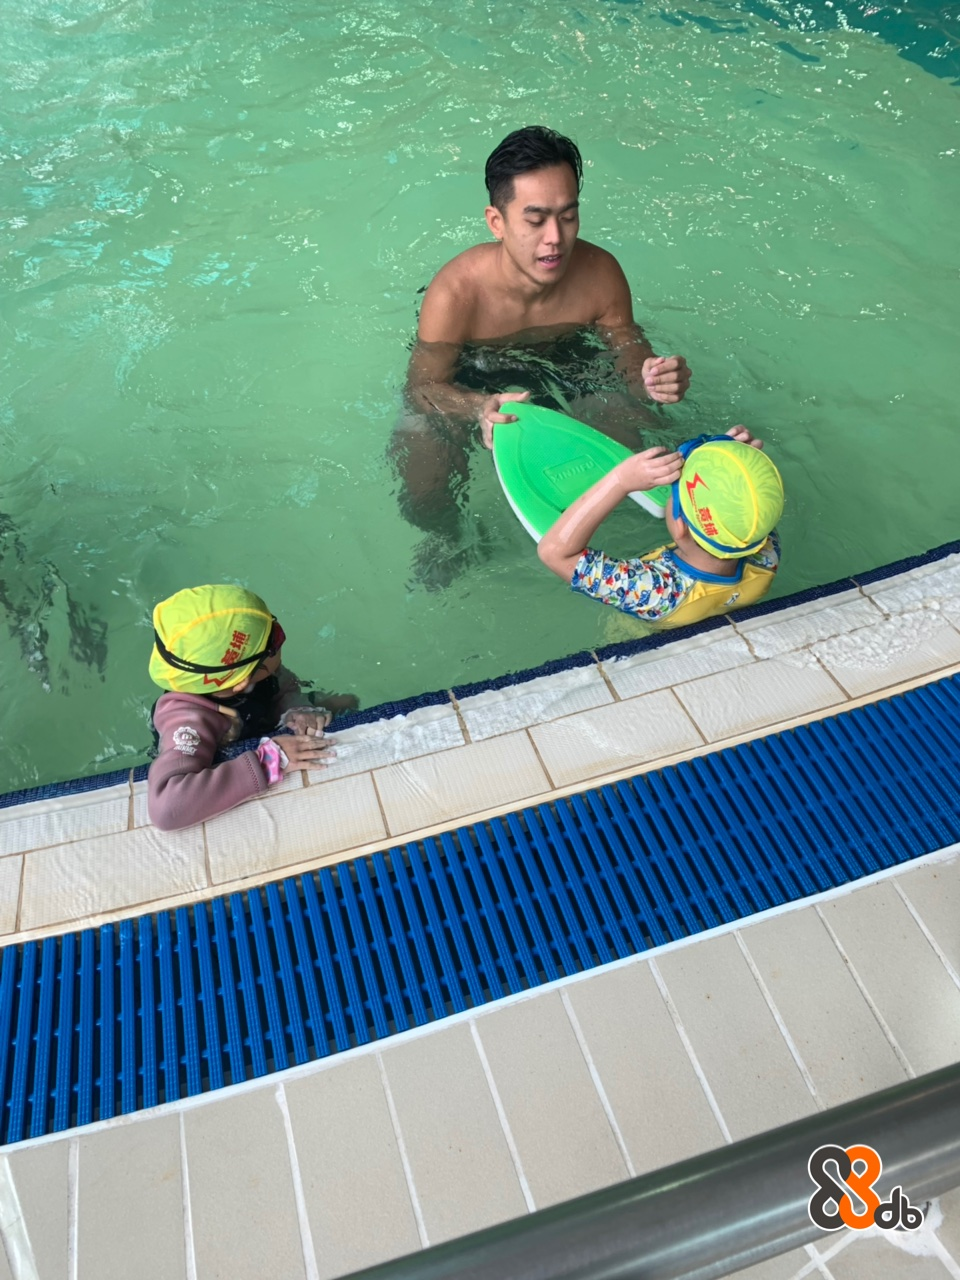 leisure,water,swimming pool,fun,vacation